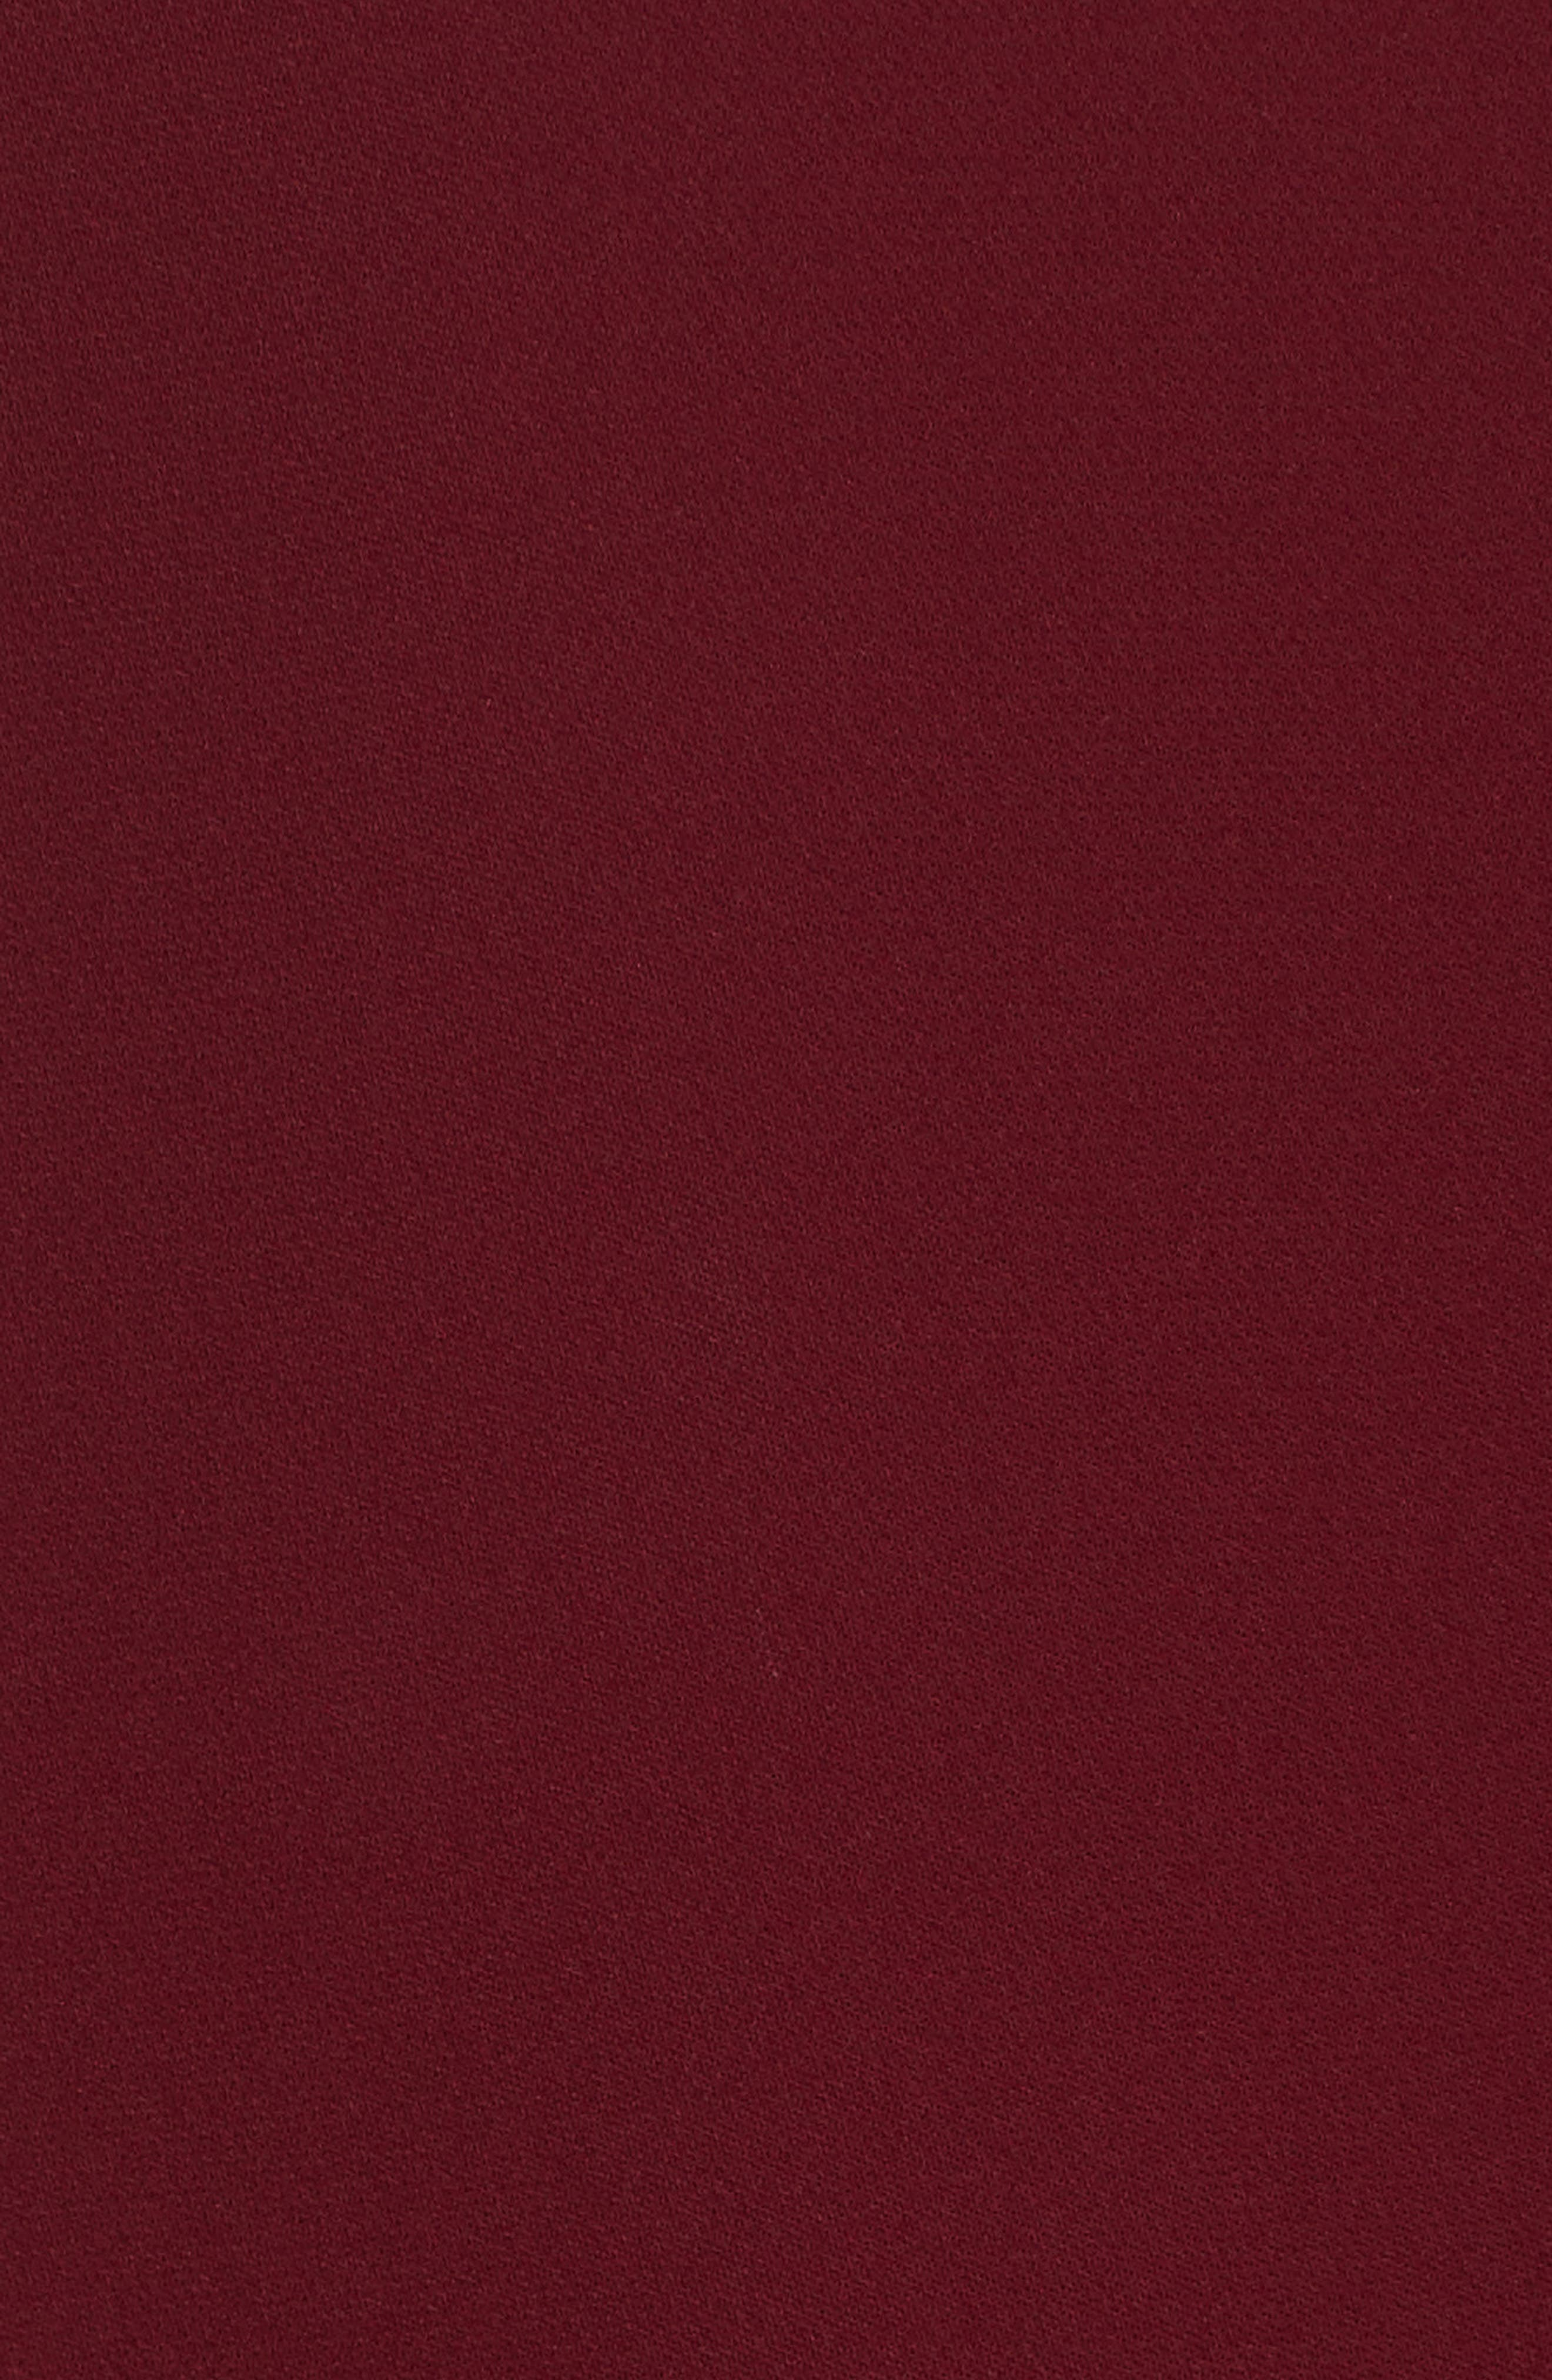 Bringam Slit Sleeve Georgette Top,                             Alternate thumbnail 6, color,                             DEEP MULBERRY